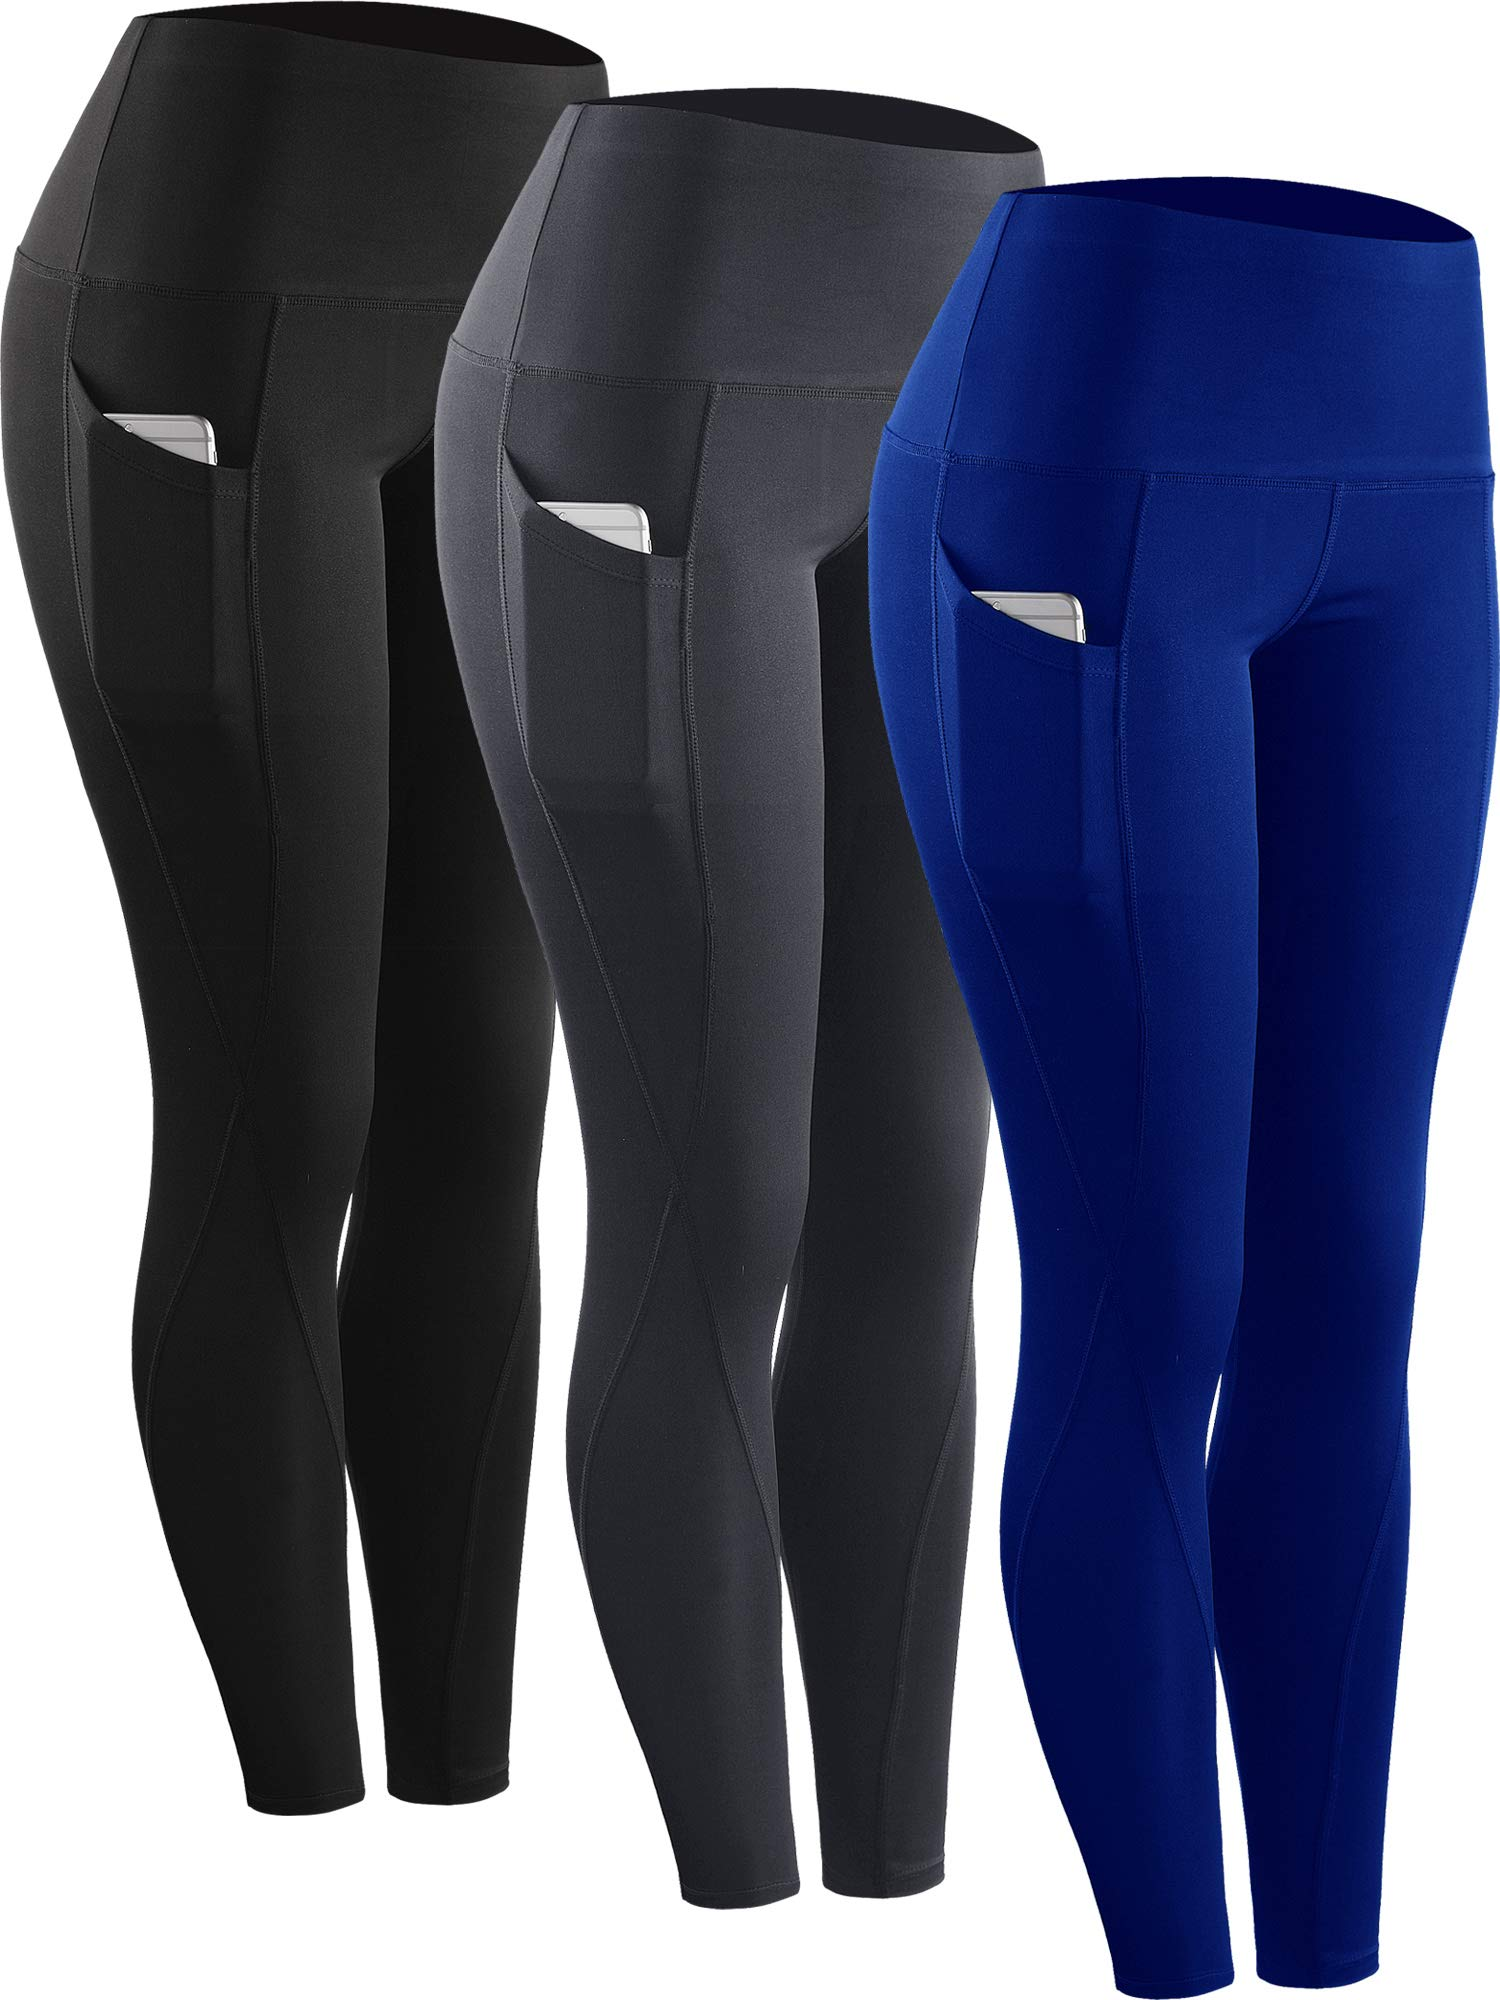 Neleus 3 Pack Tummy Control High Waist Running Workout Leggings,9017,Black,Grey,Blue,US M,EU L by Neleus